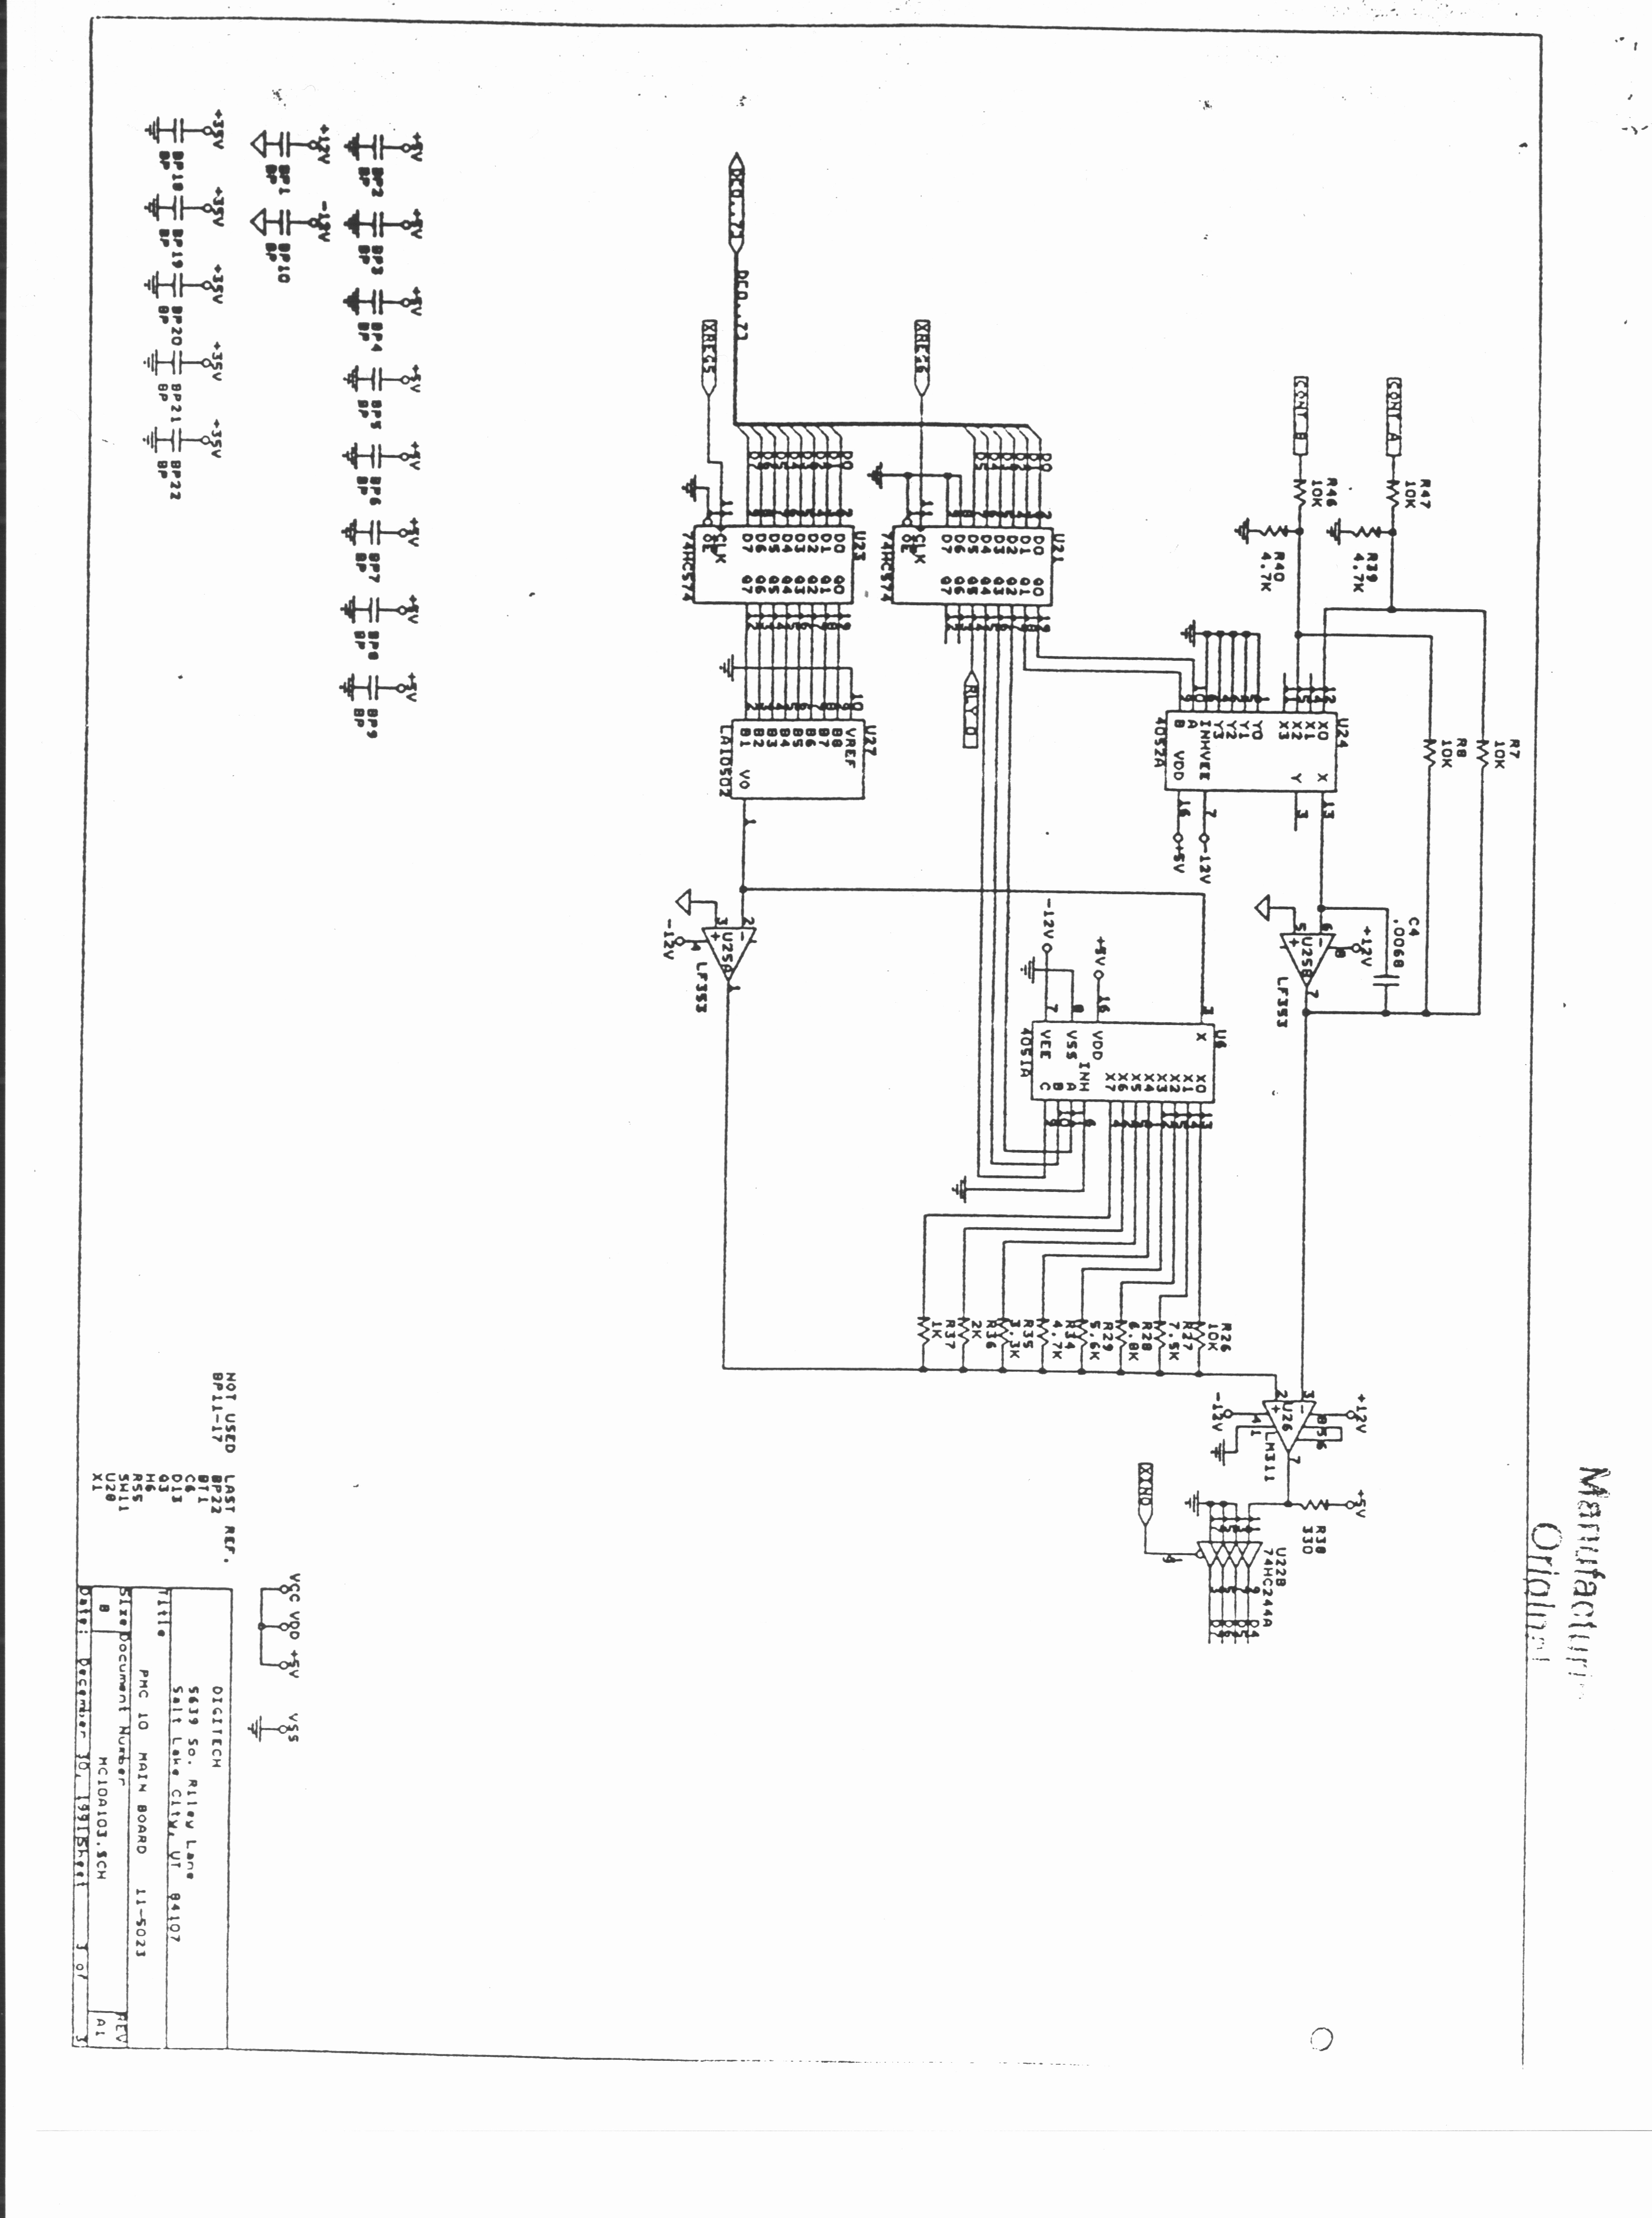 Digitech Pmc 10 Midi Foot Pedal